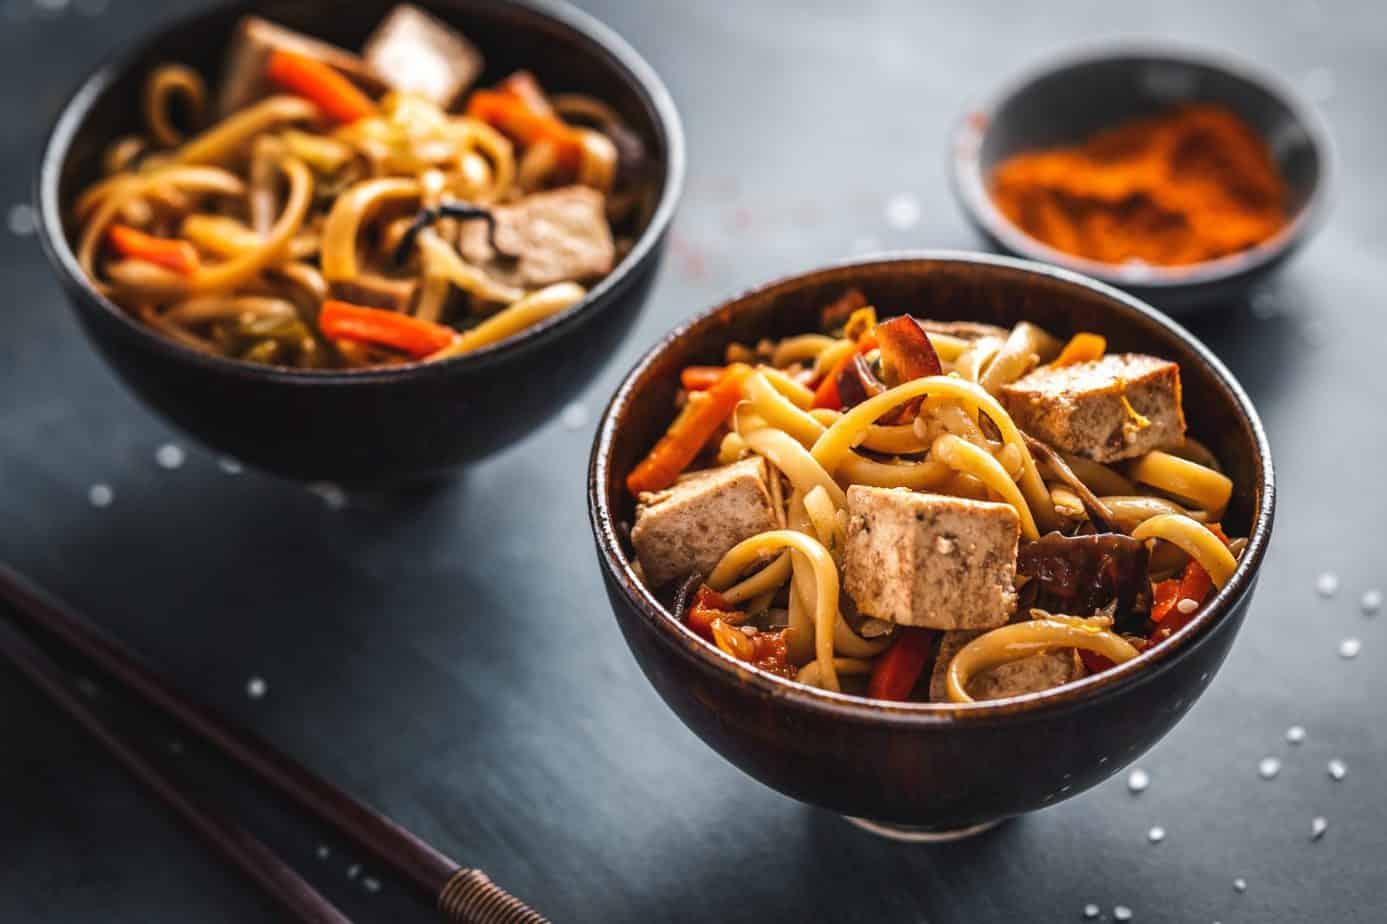 are udon noodles vegan?